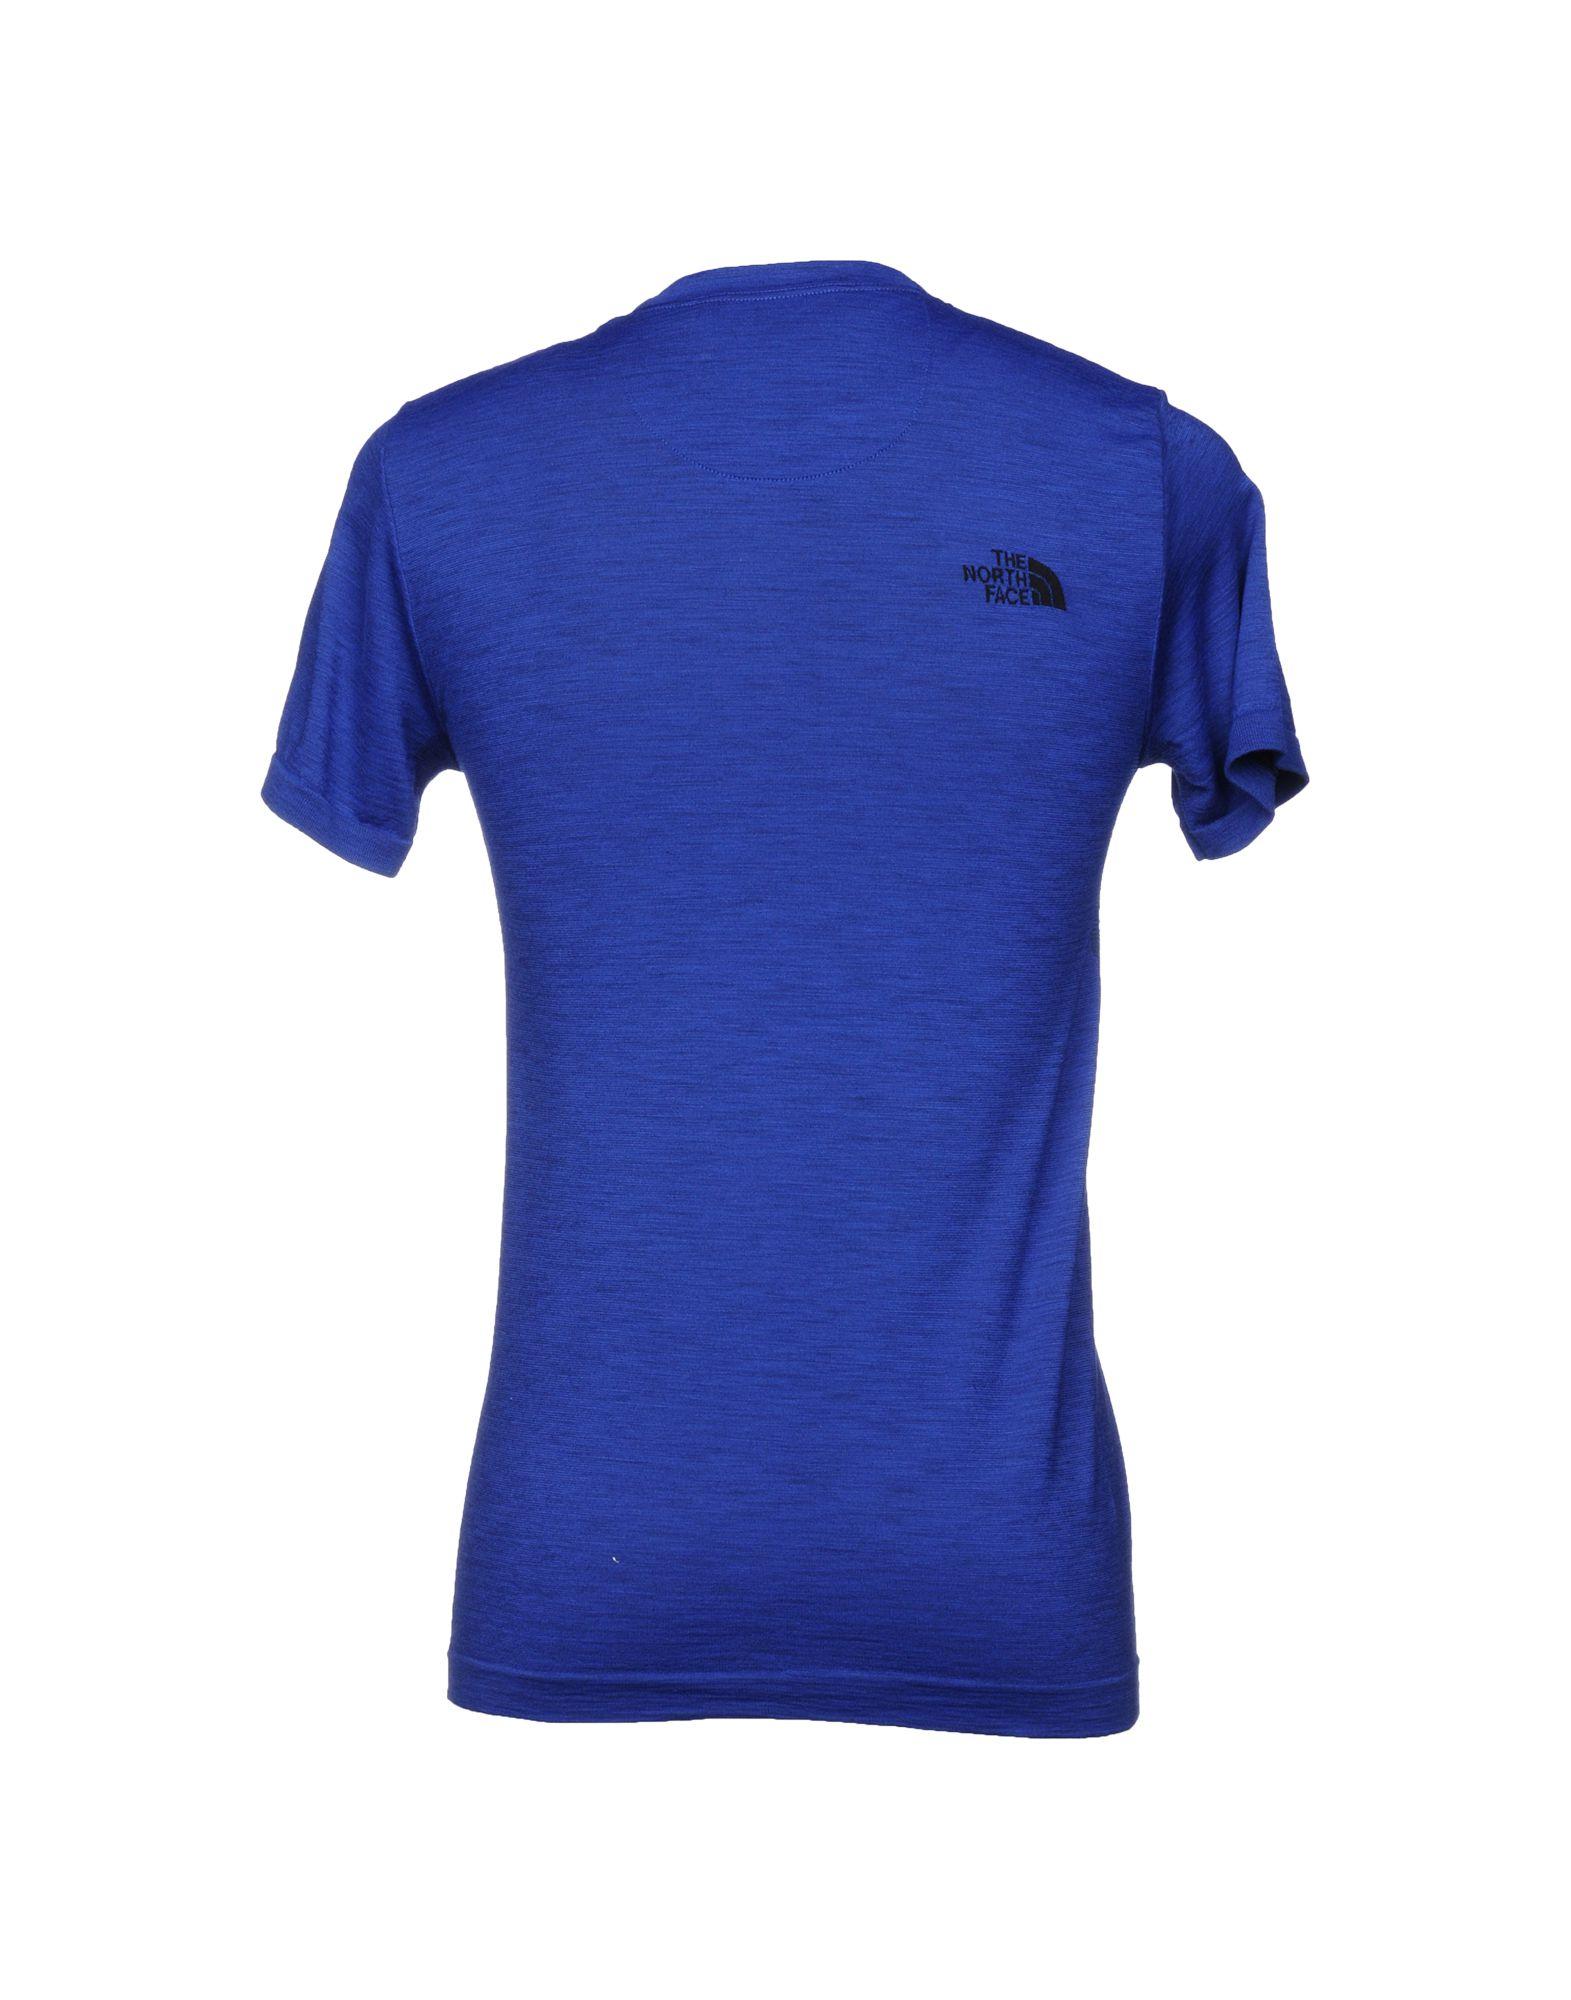 T-Shirt The - North Face Uomo - The 12139479GU c028e2